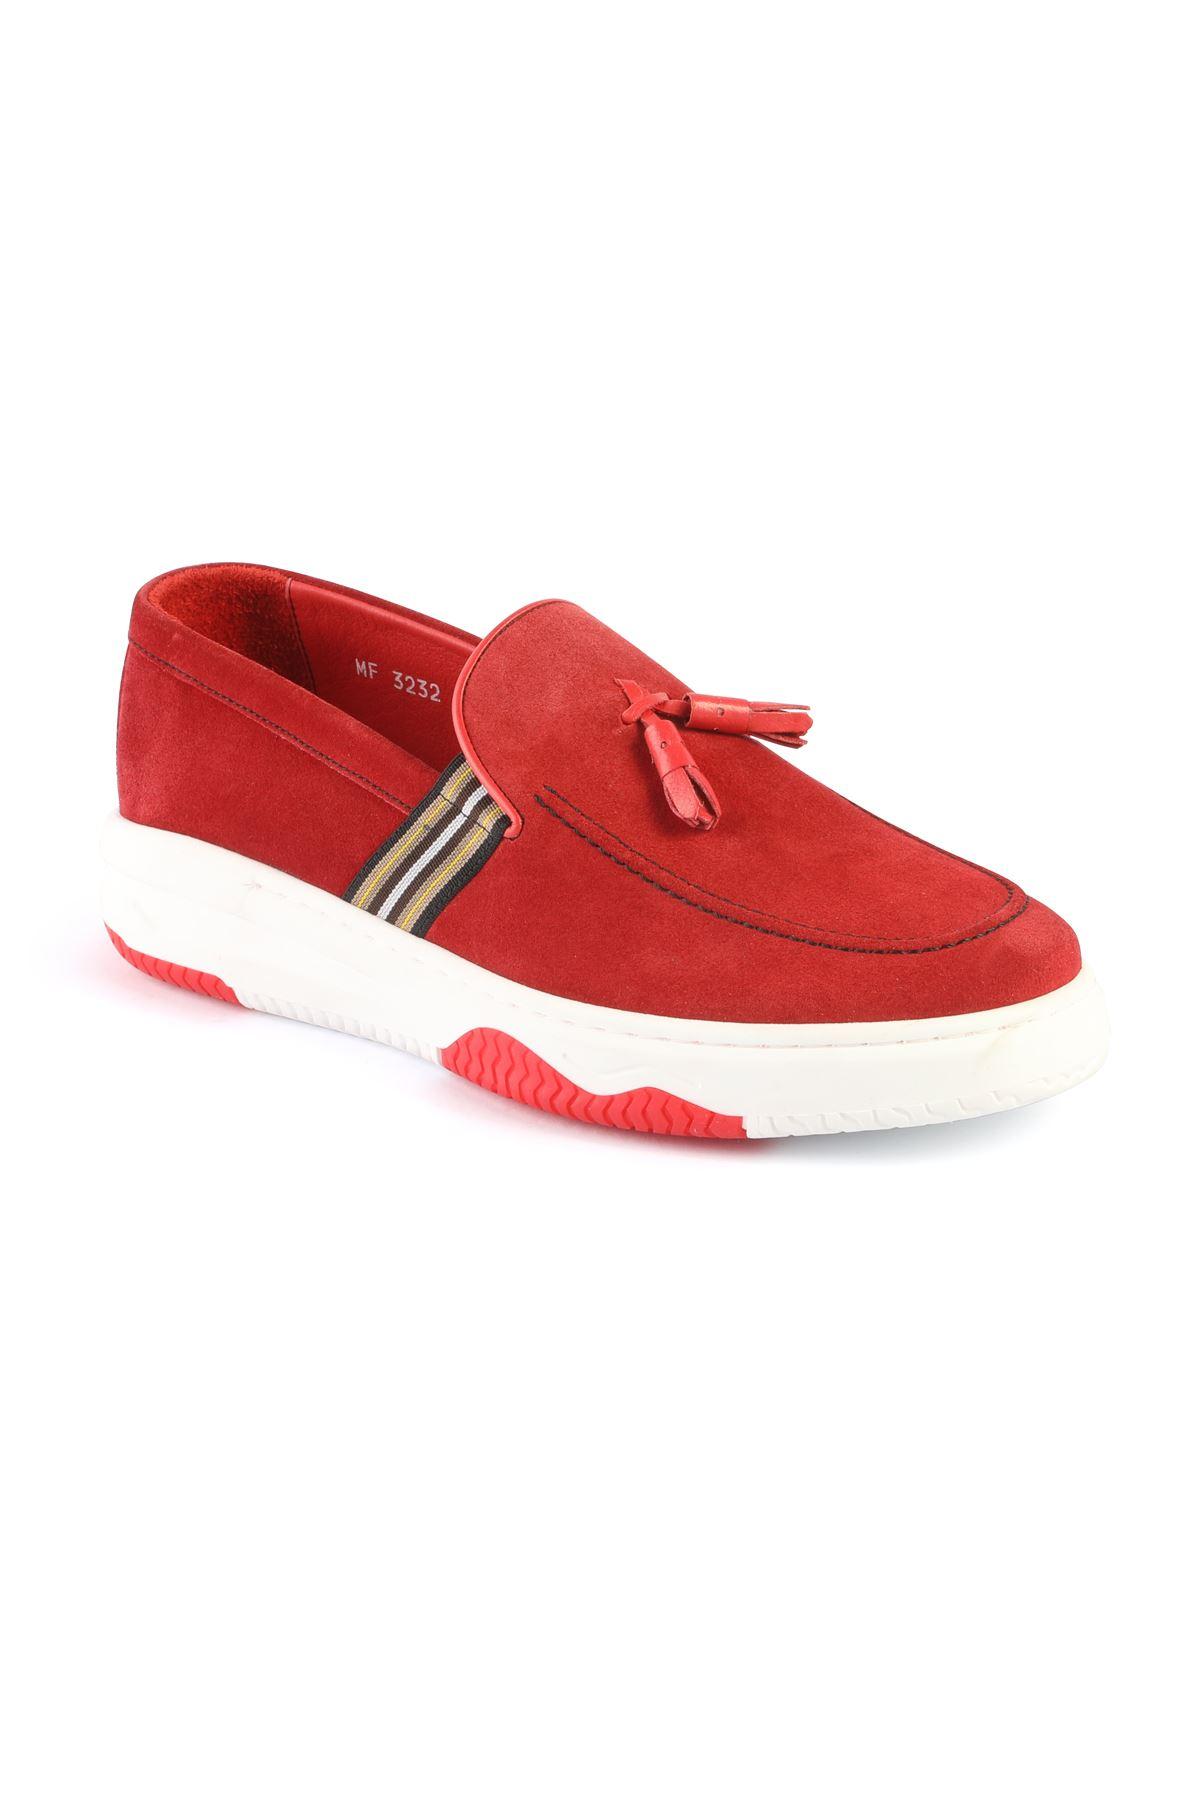 Libero L3232 Krem Loafer Ayakkabı